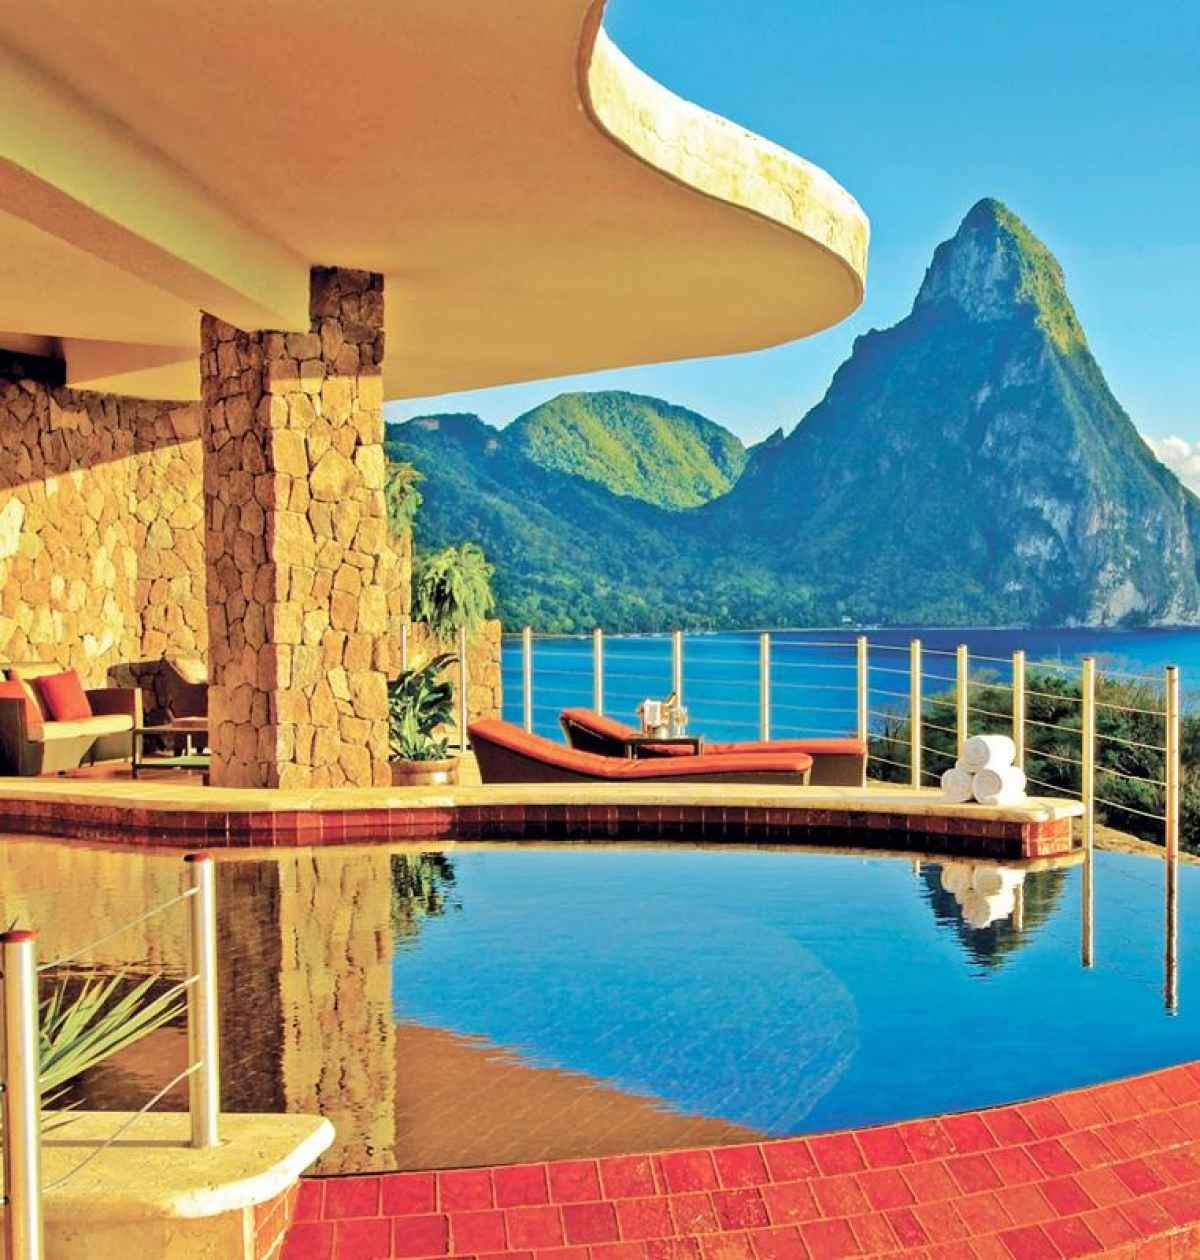 4. Saint Lucia